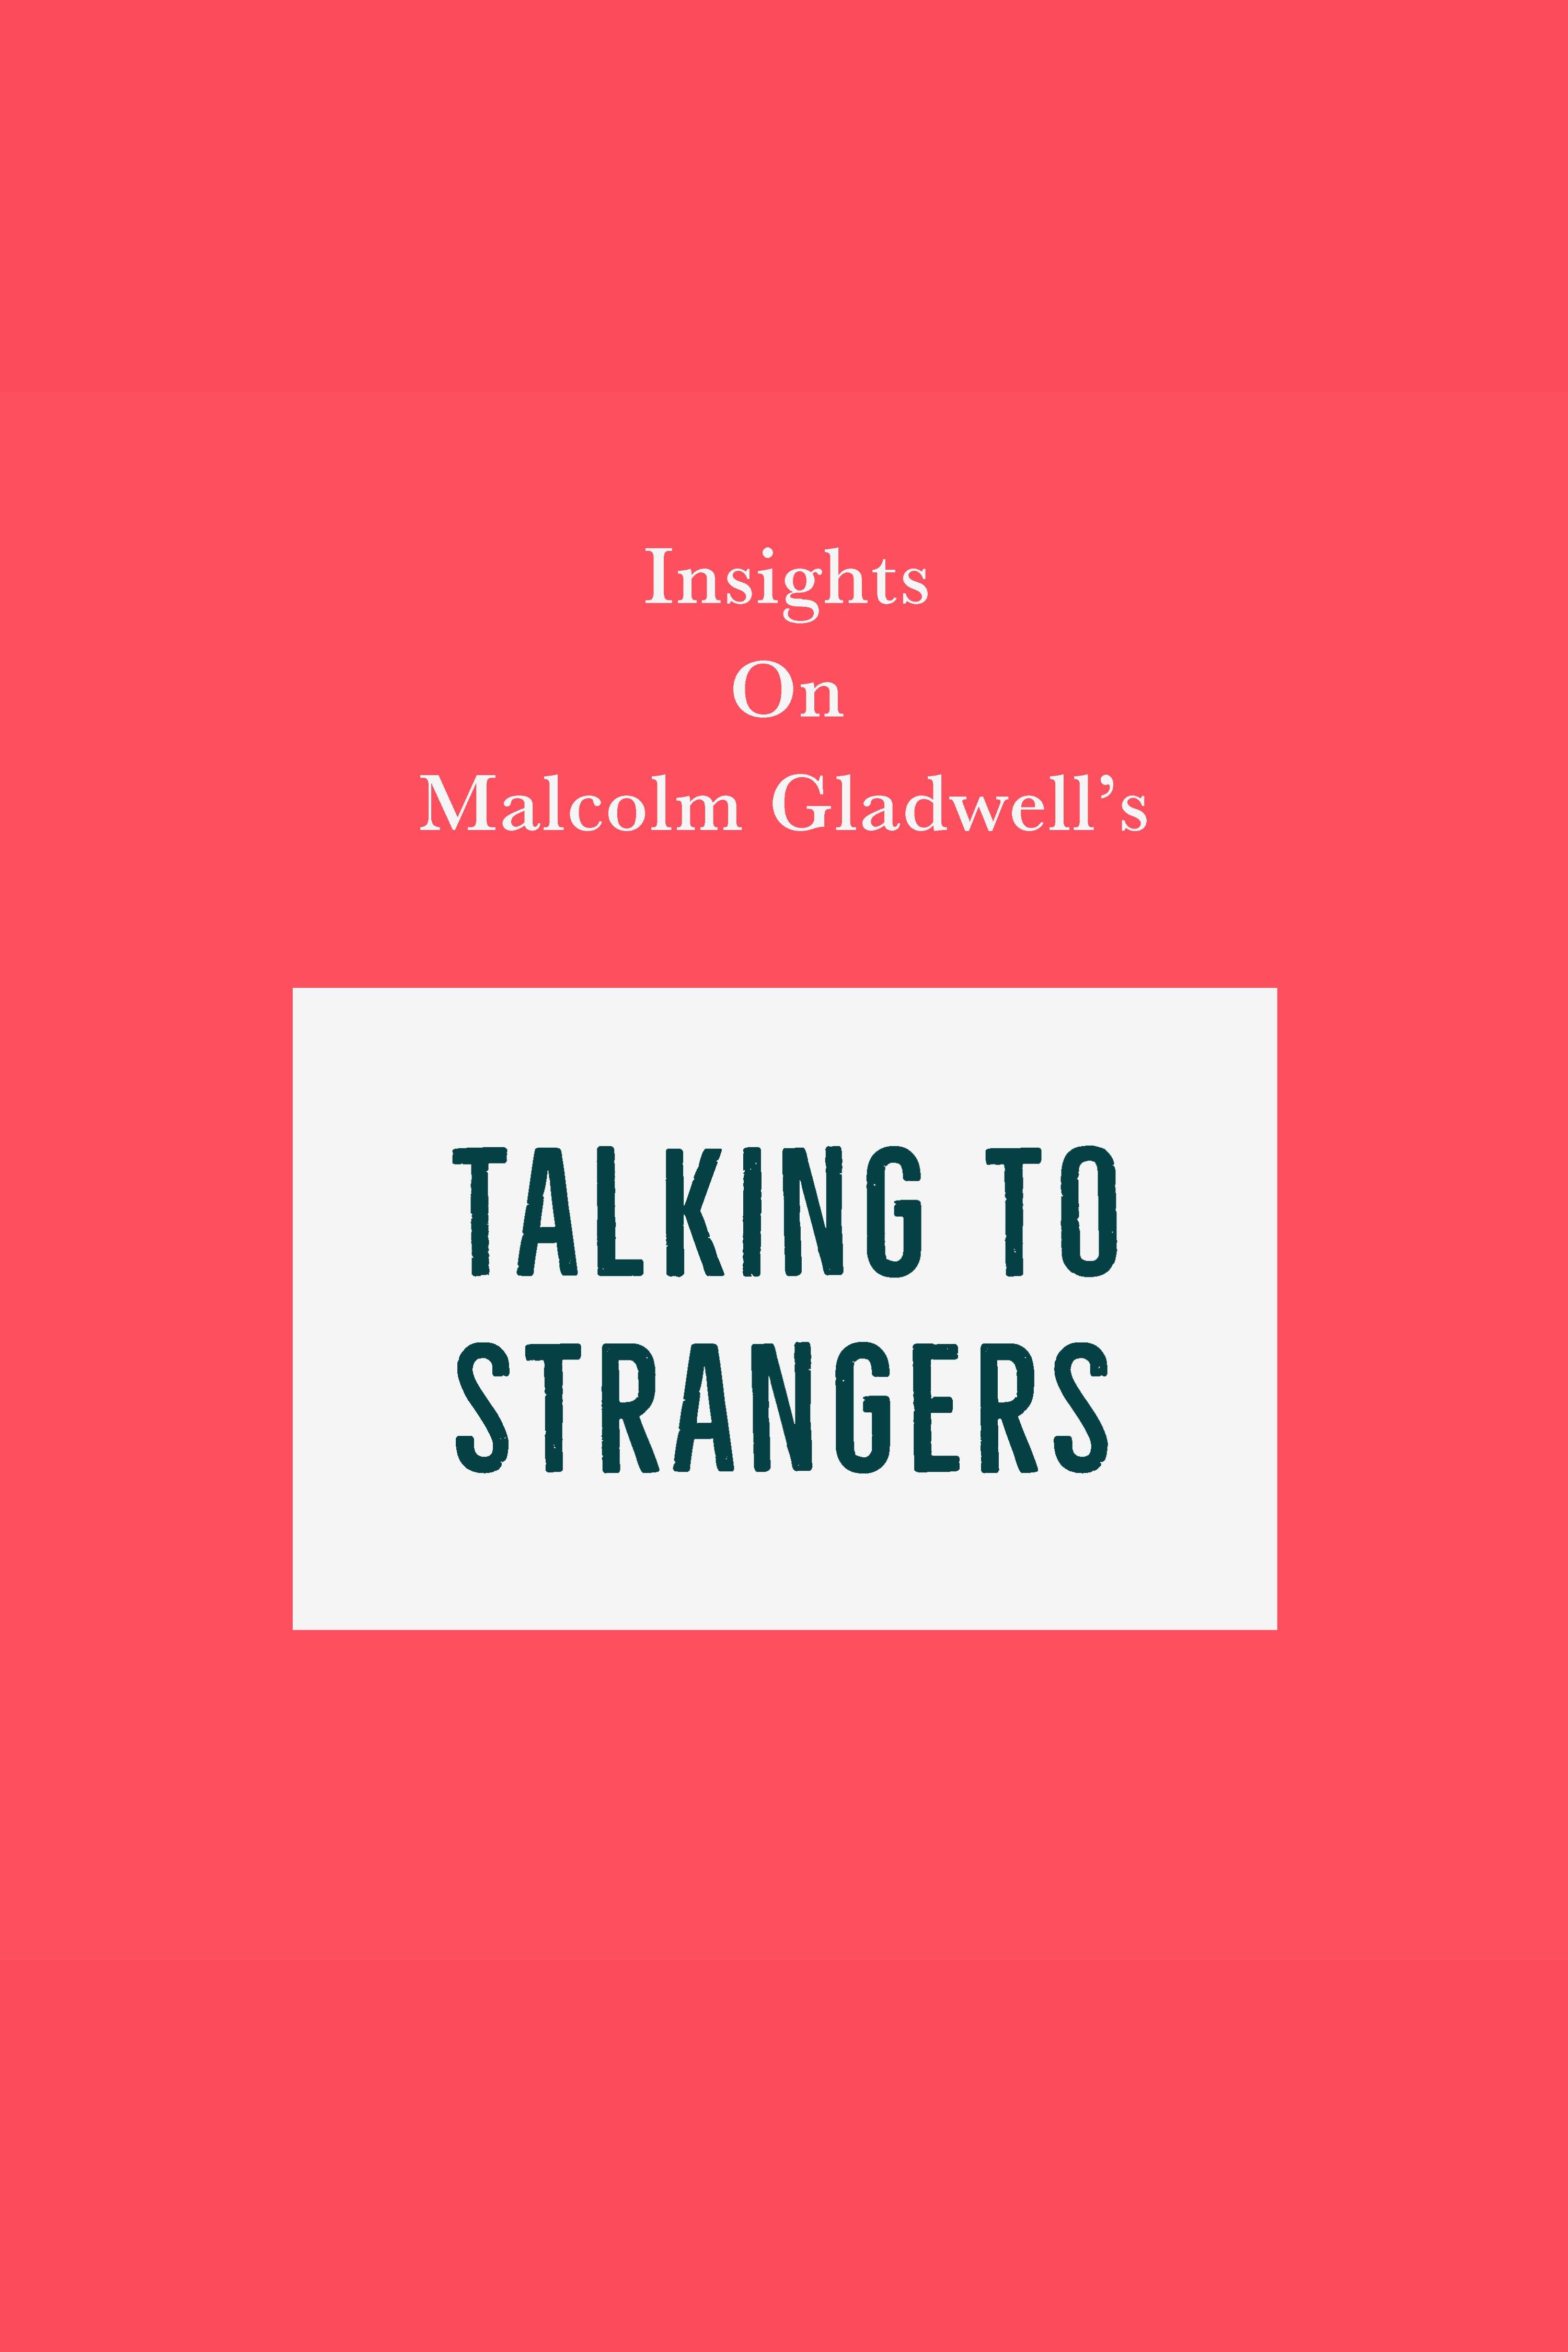 Esta es la portada del audiolibro Insights on Malcolm Gladwell's Talking to Strangers